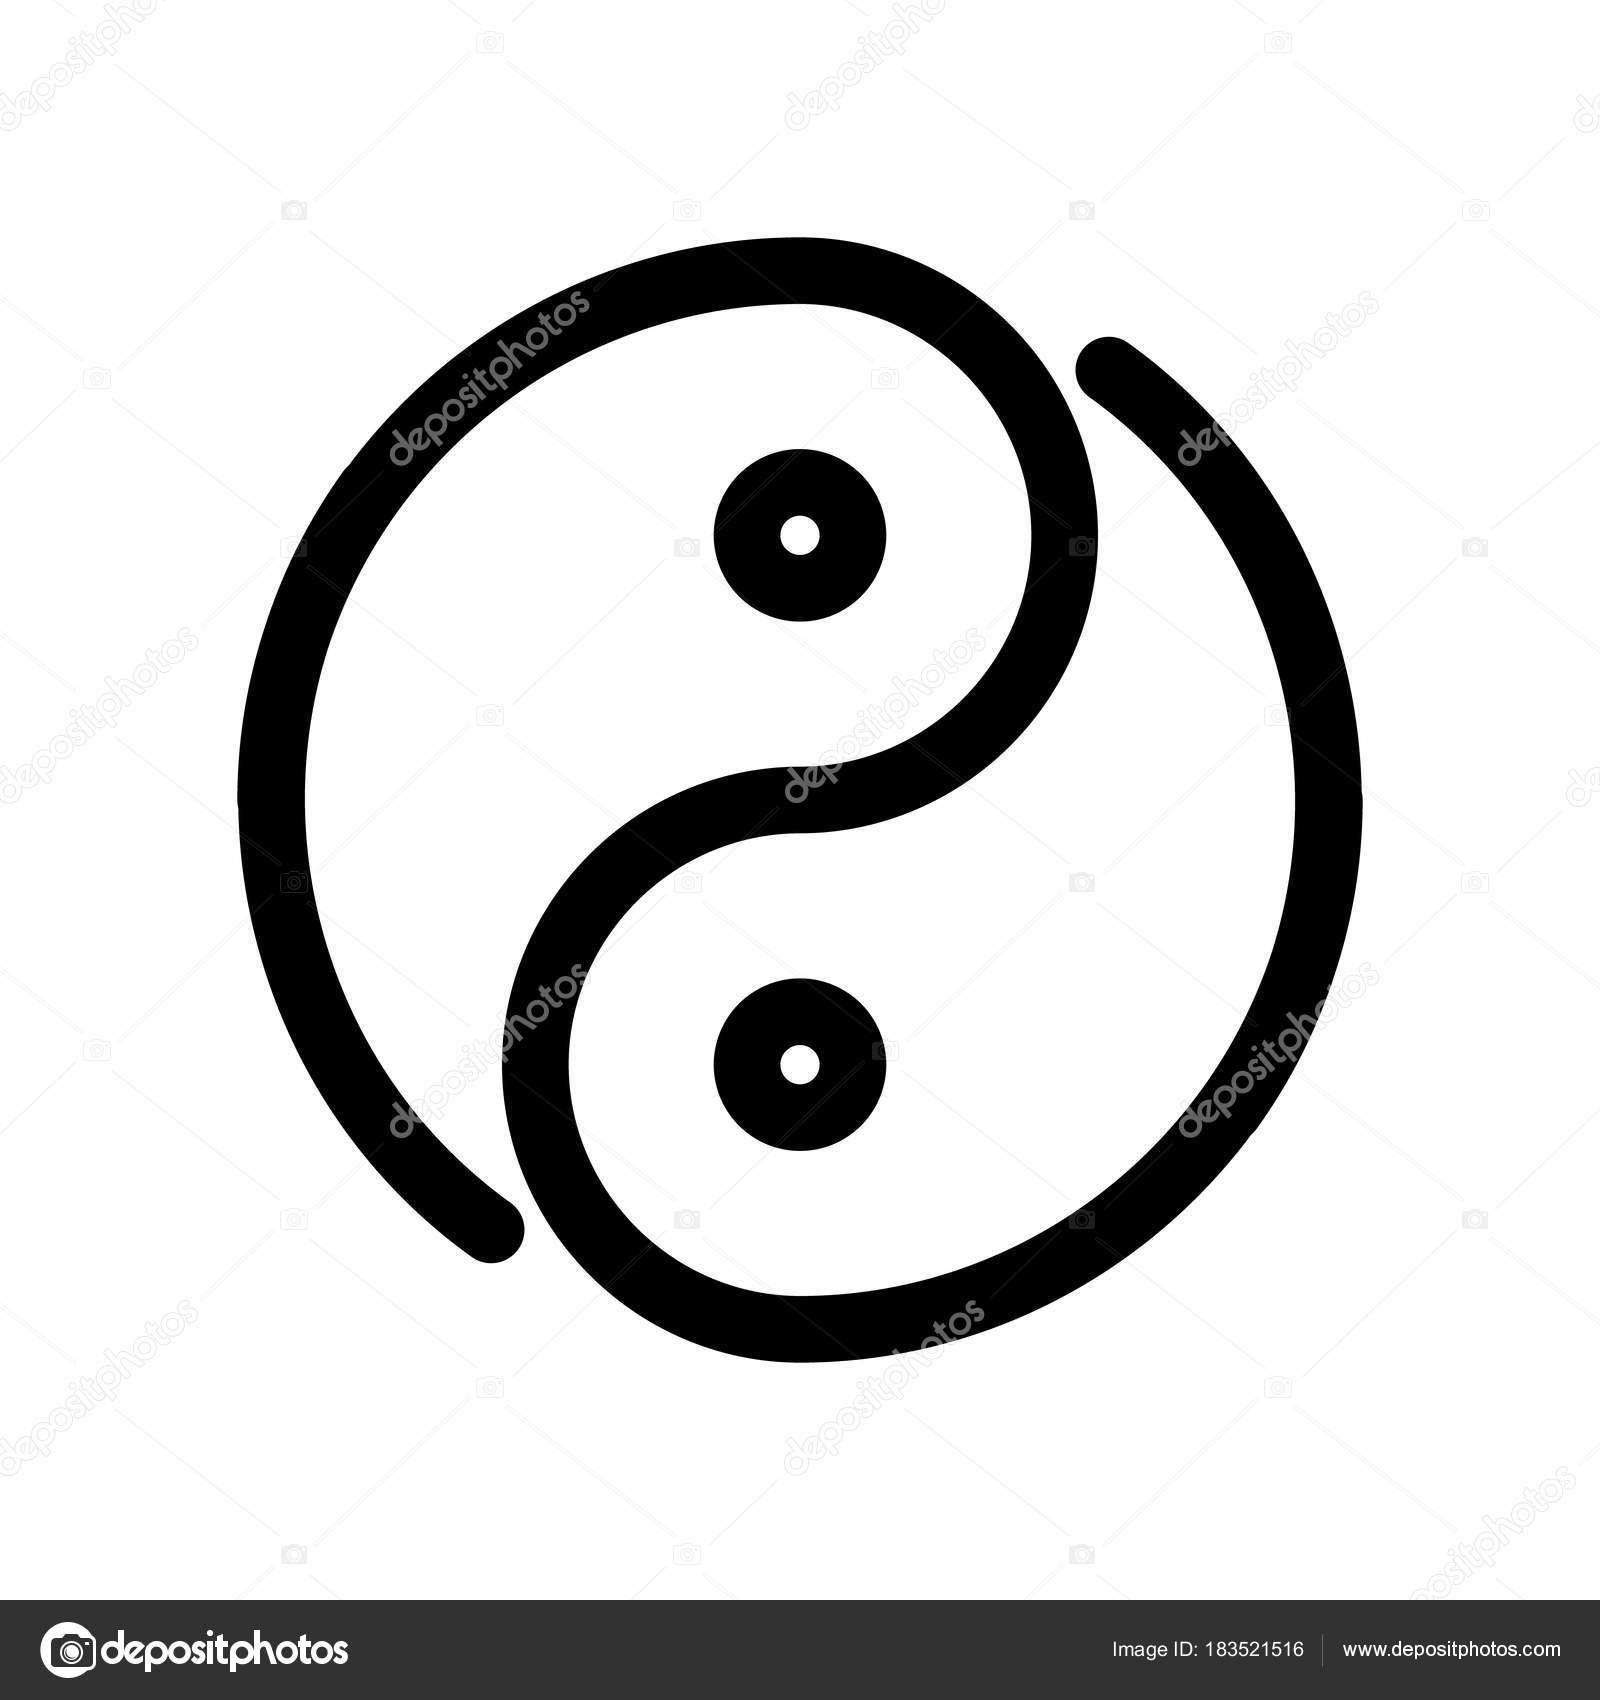 yin yang icon outline modern design element simple black flat rh depositphotos com Yin Yang Art Yin Yang Symbol